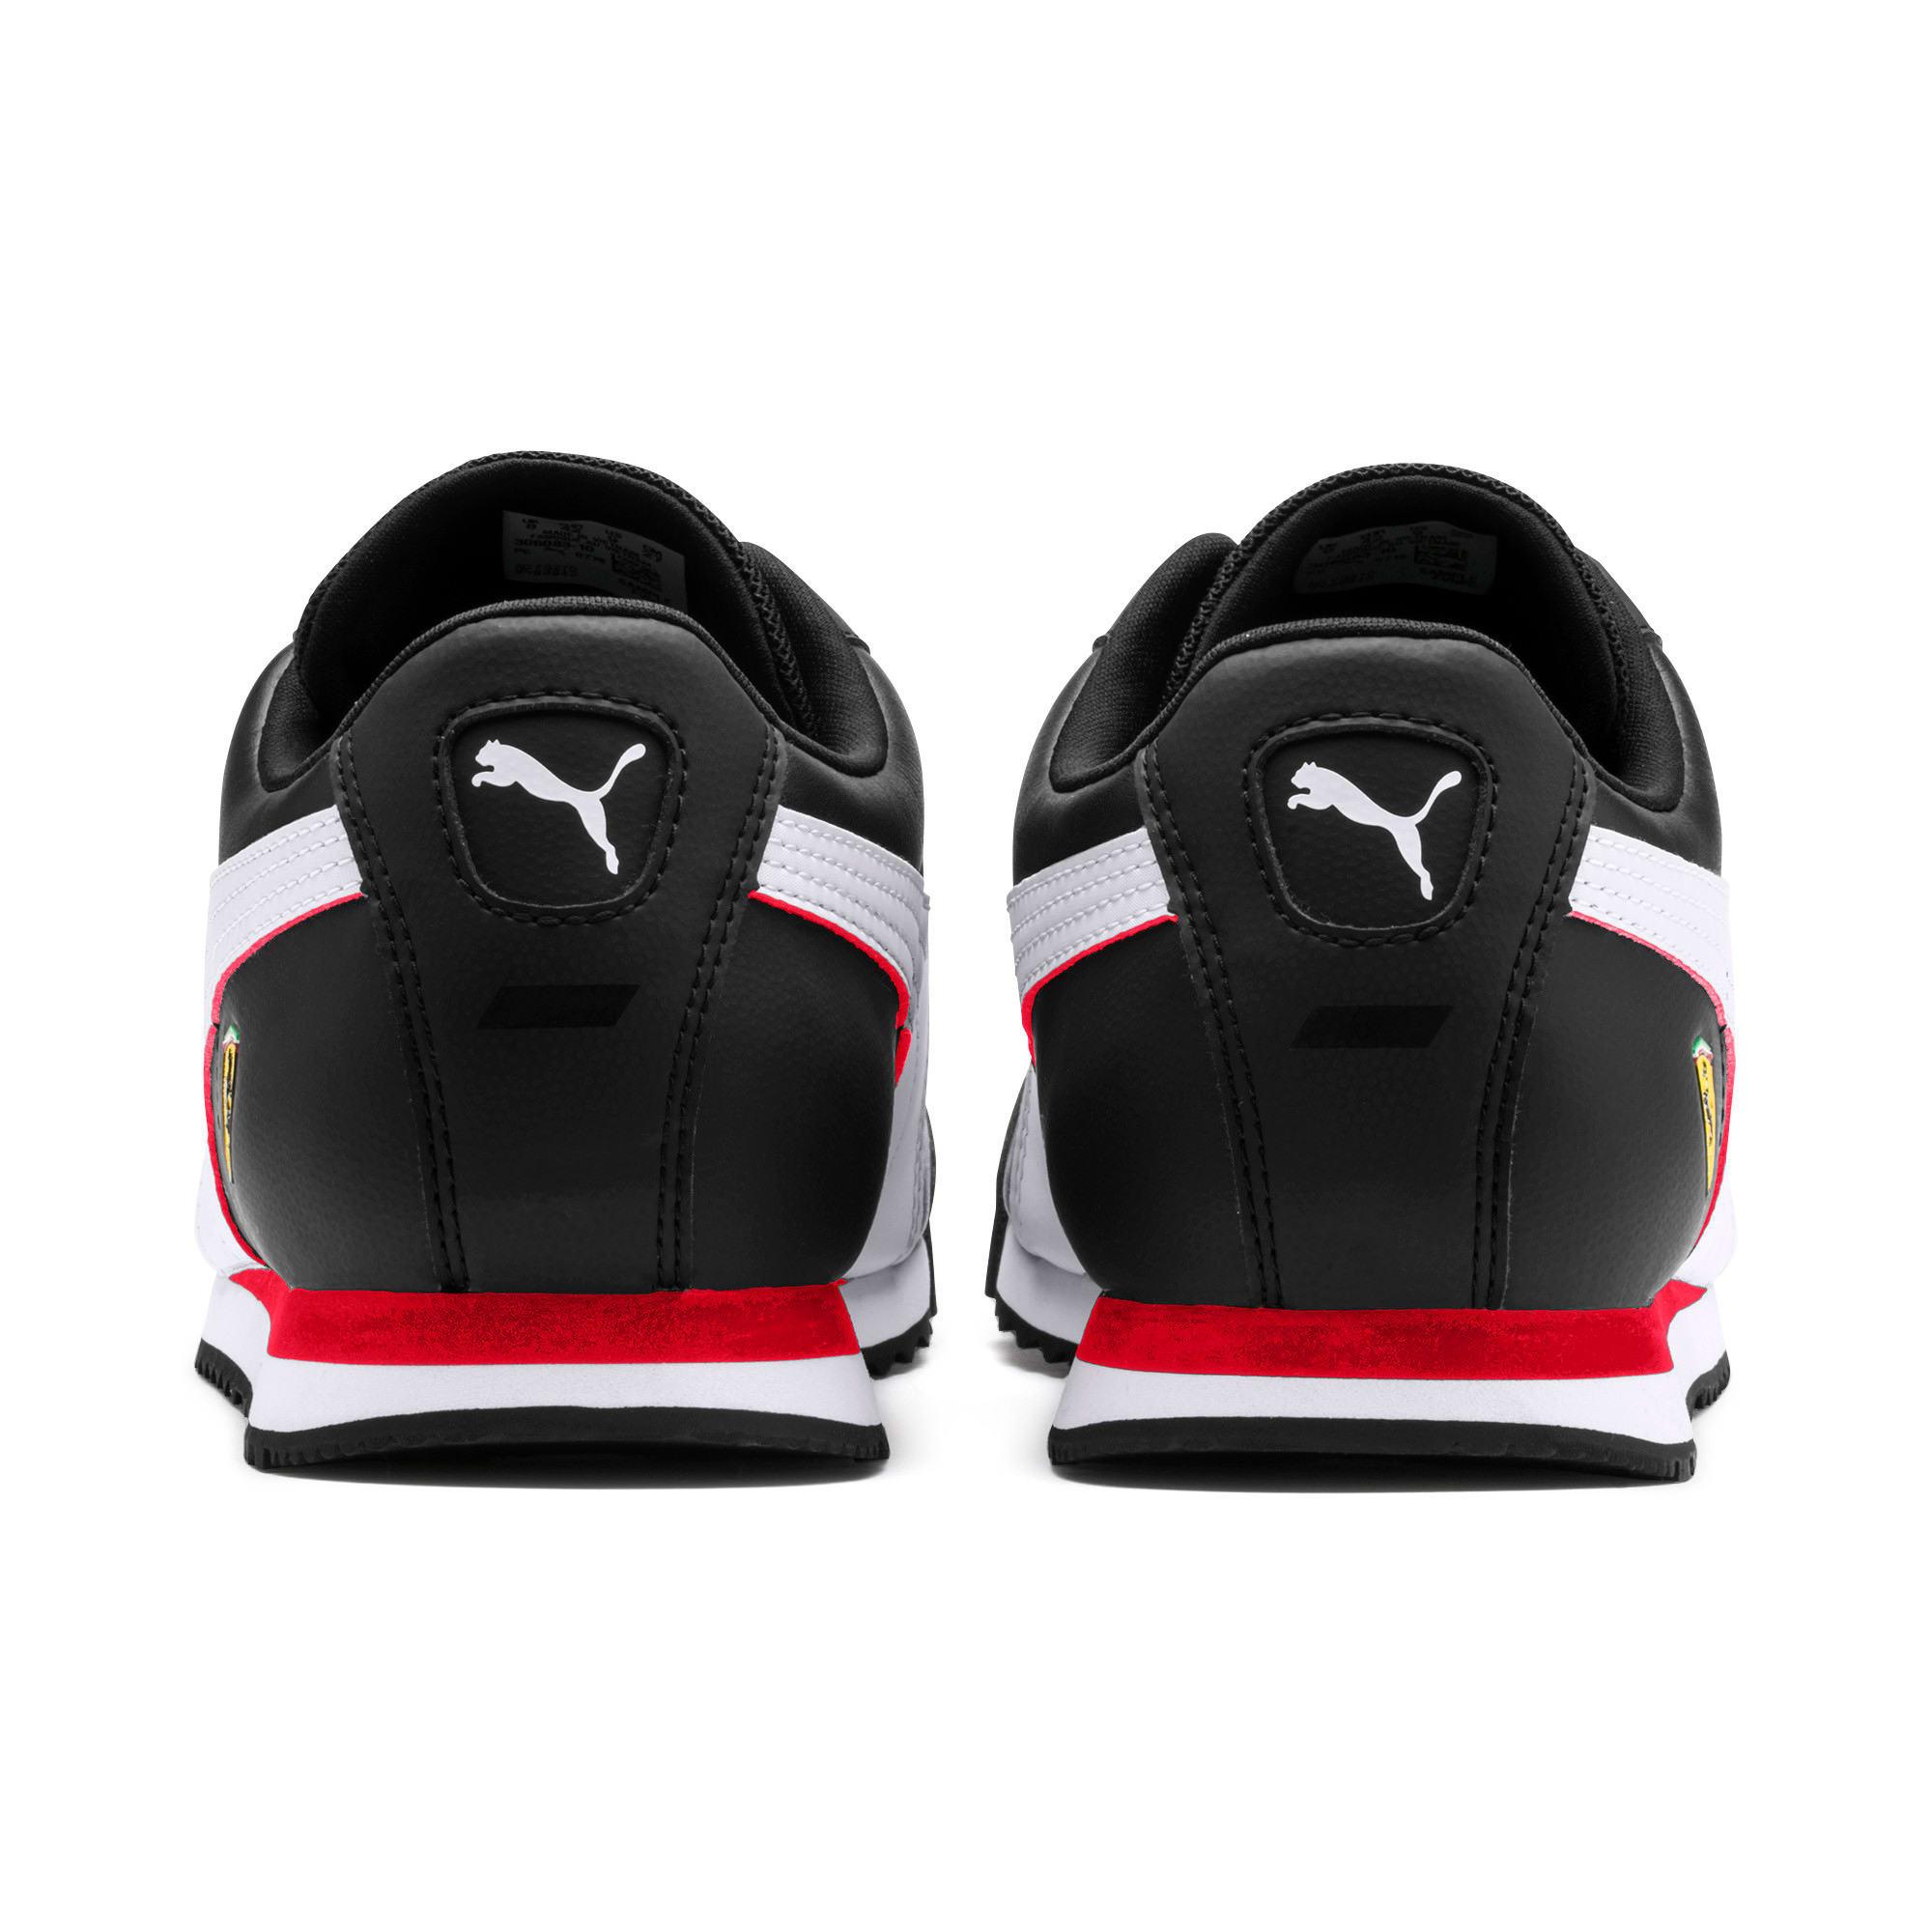 Thumbnail 4 of Scuderia Ferrari Roma Men's Sneakers, Black-White-Rosso Corsa, medium